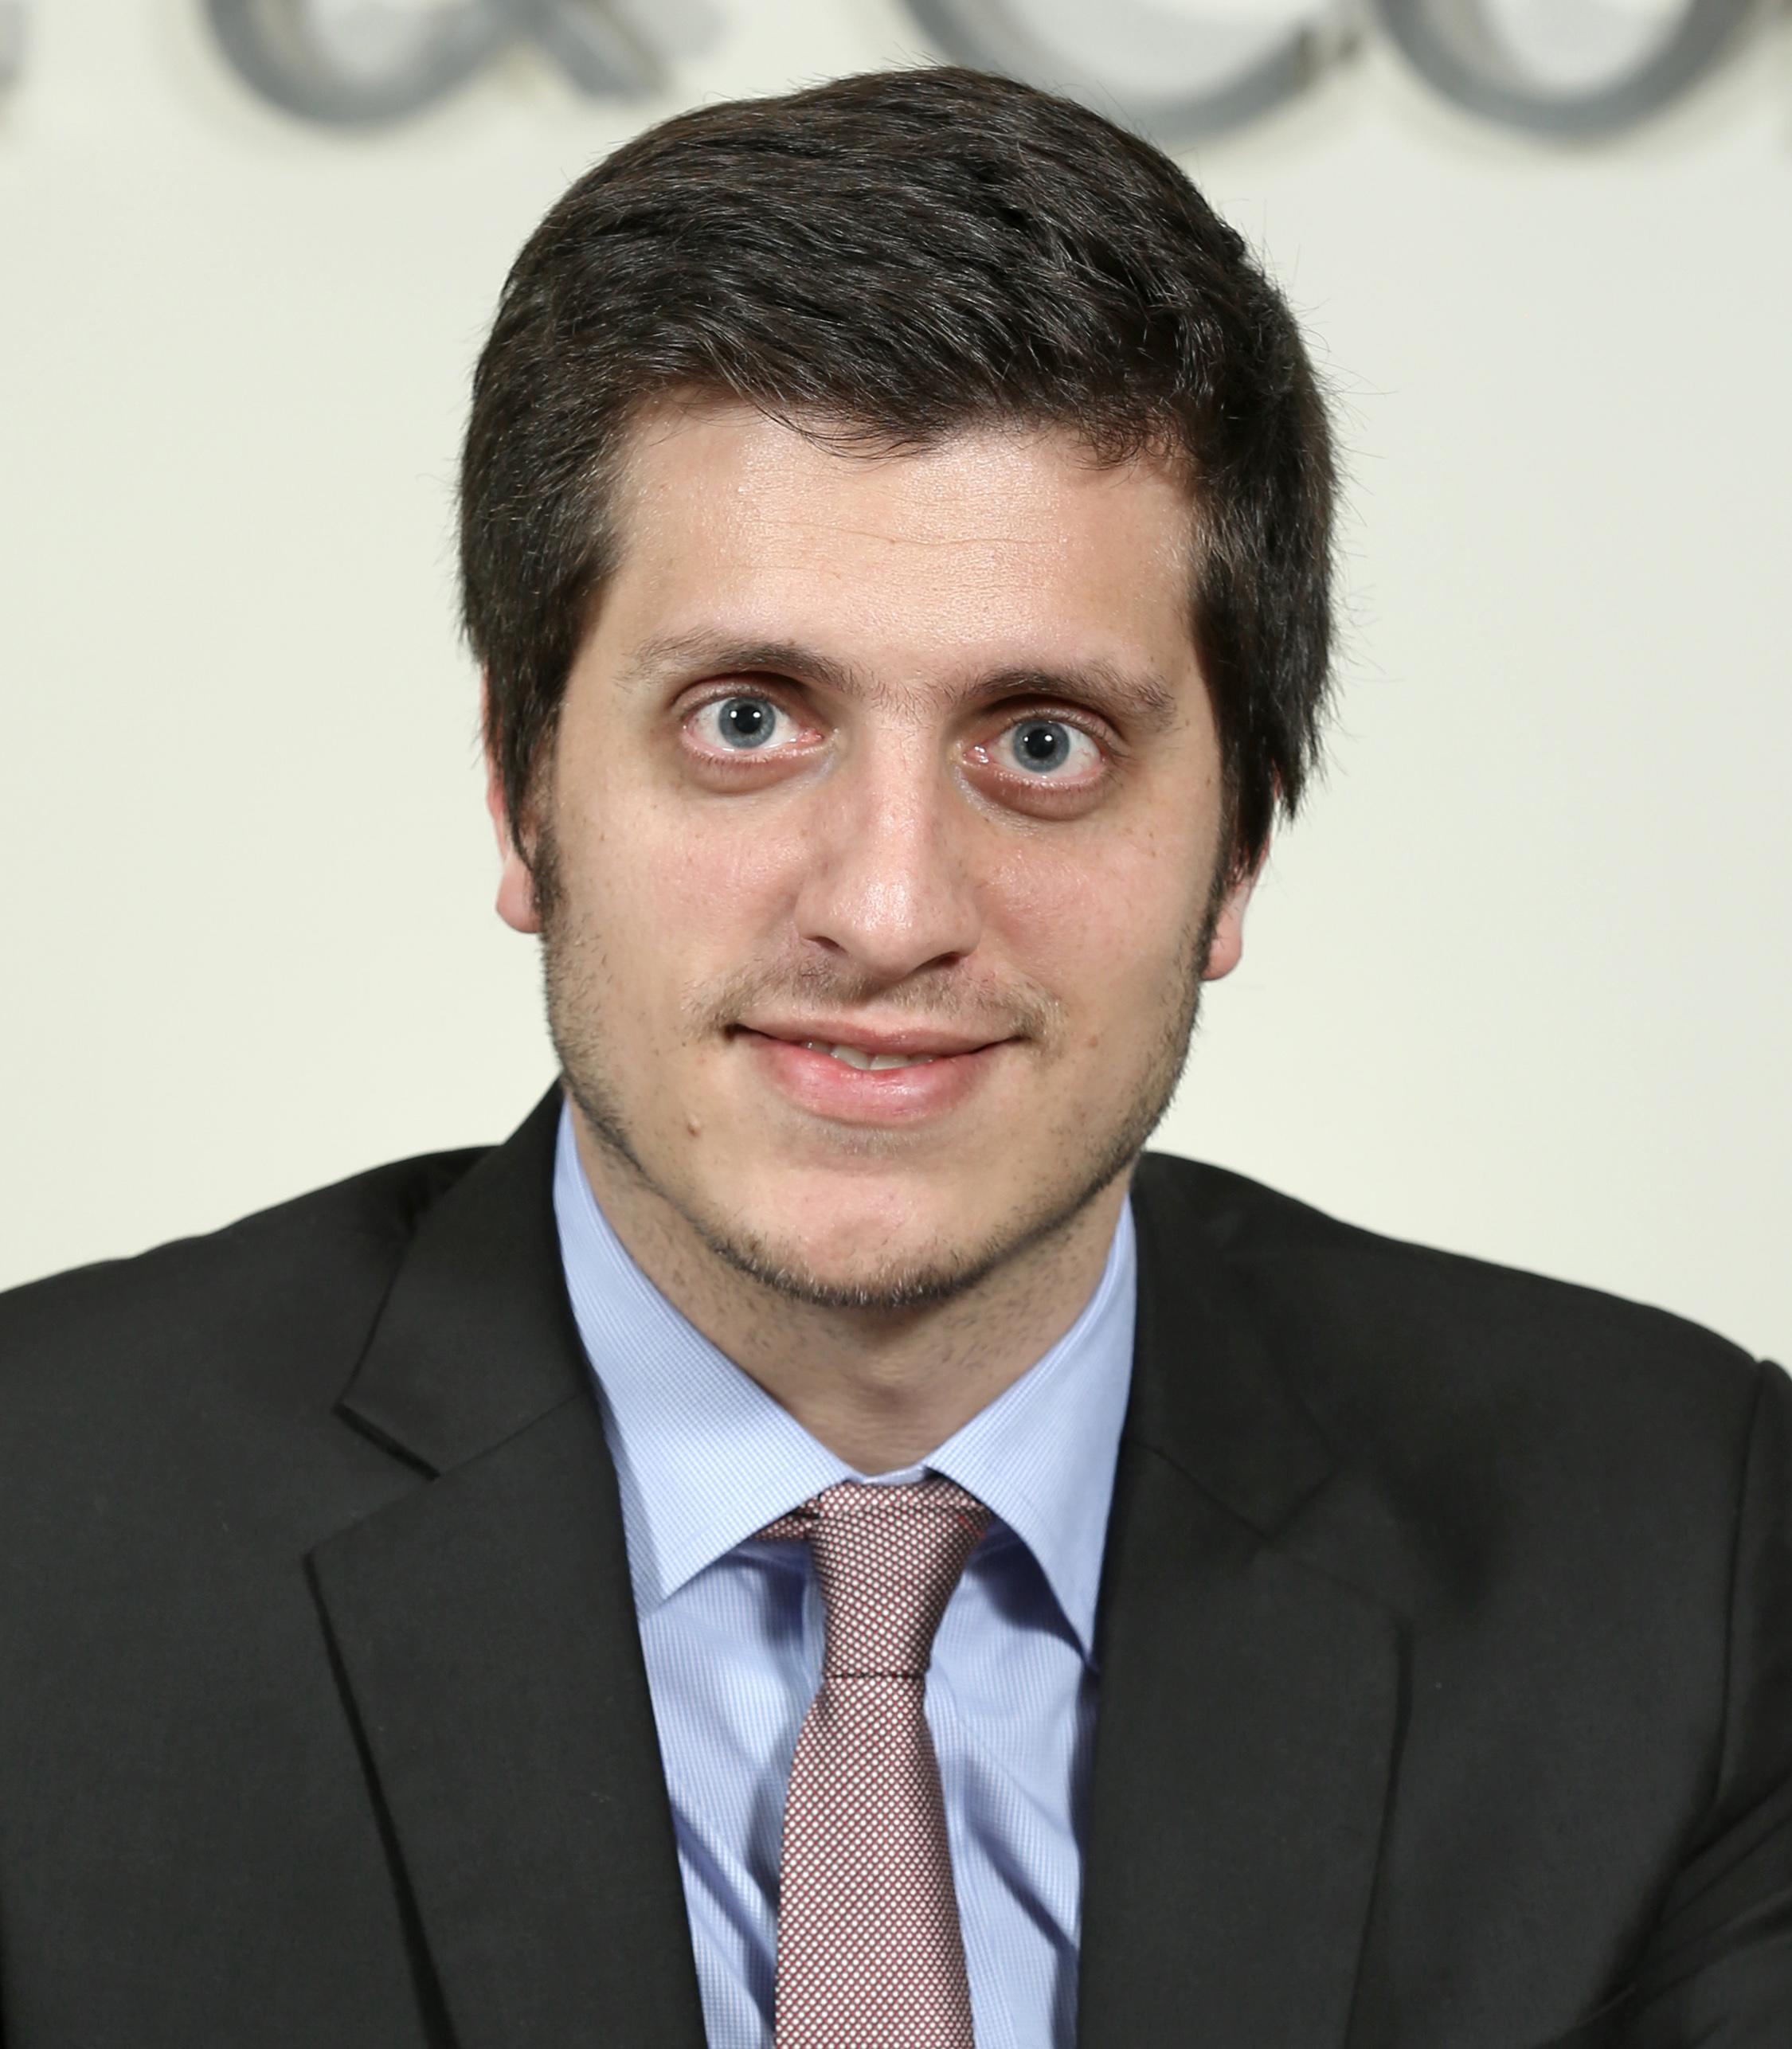 Lautaro Mazzeo